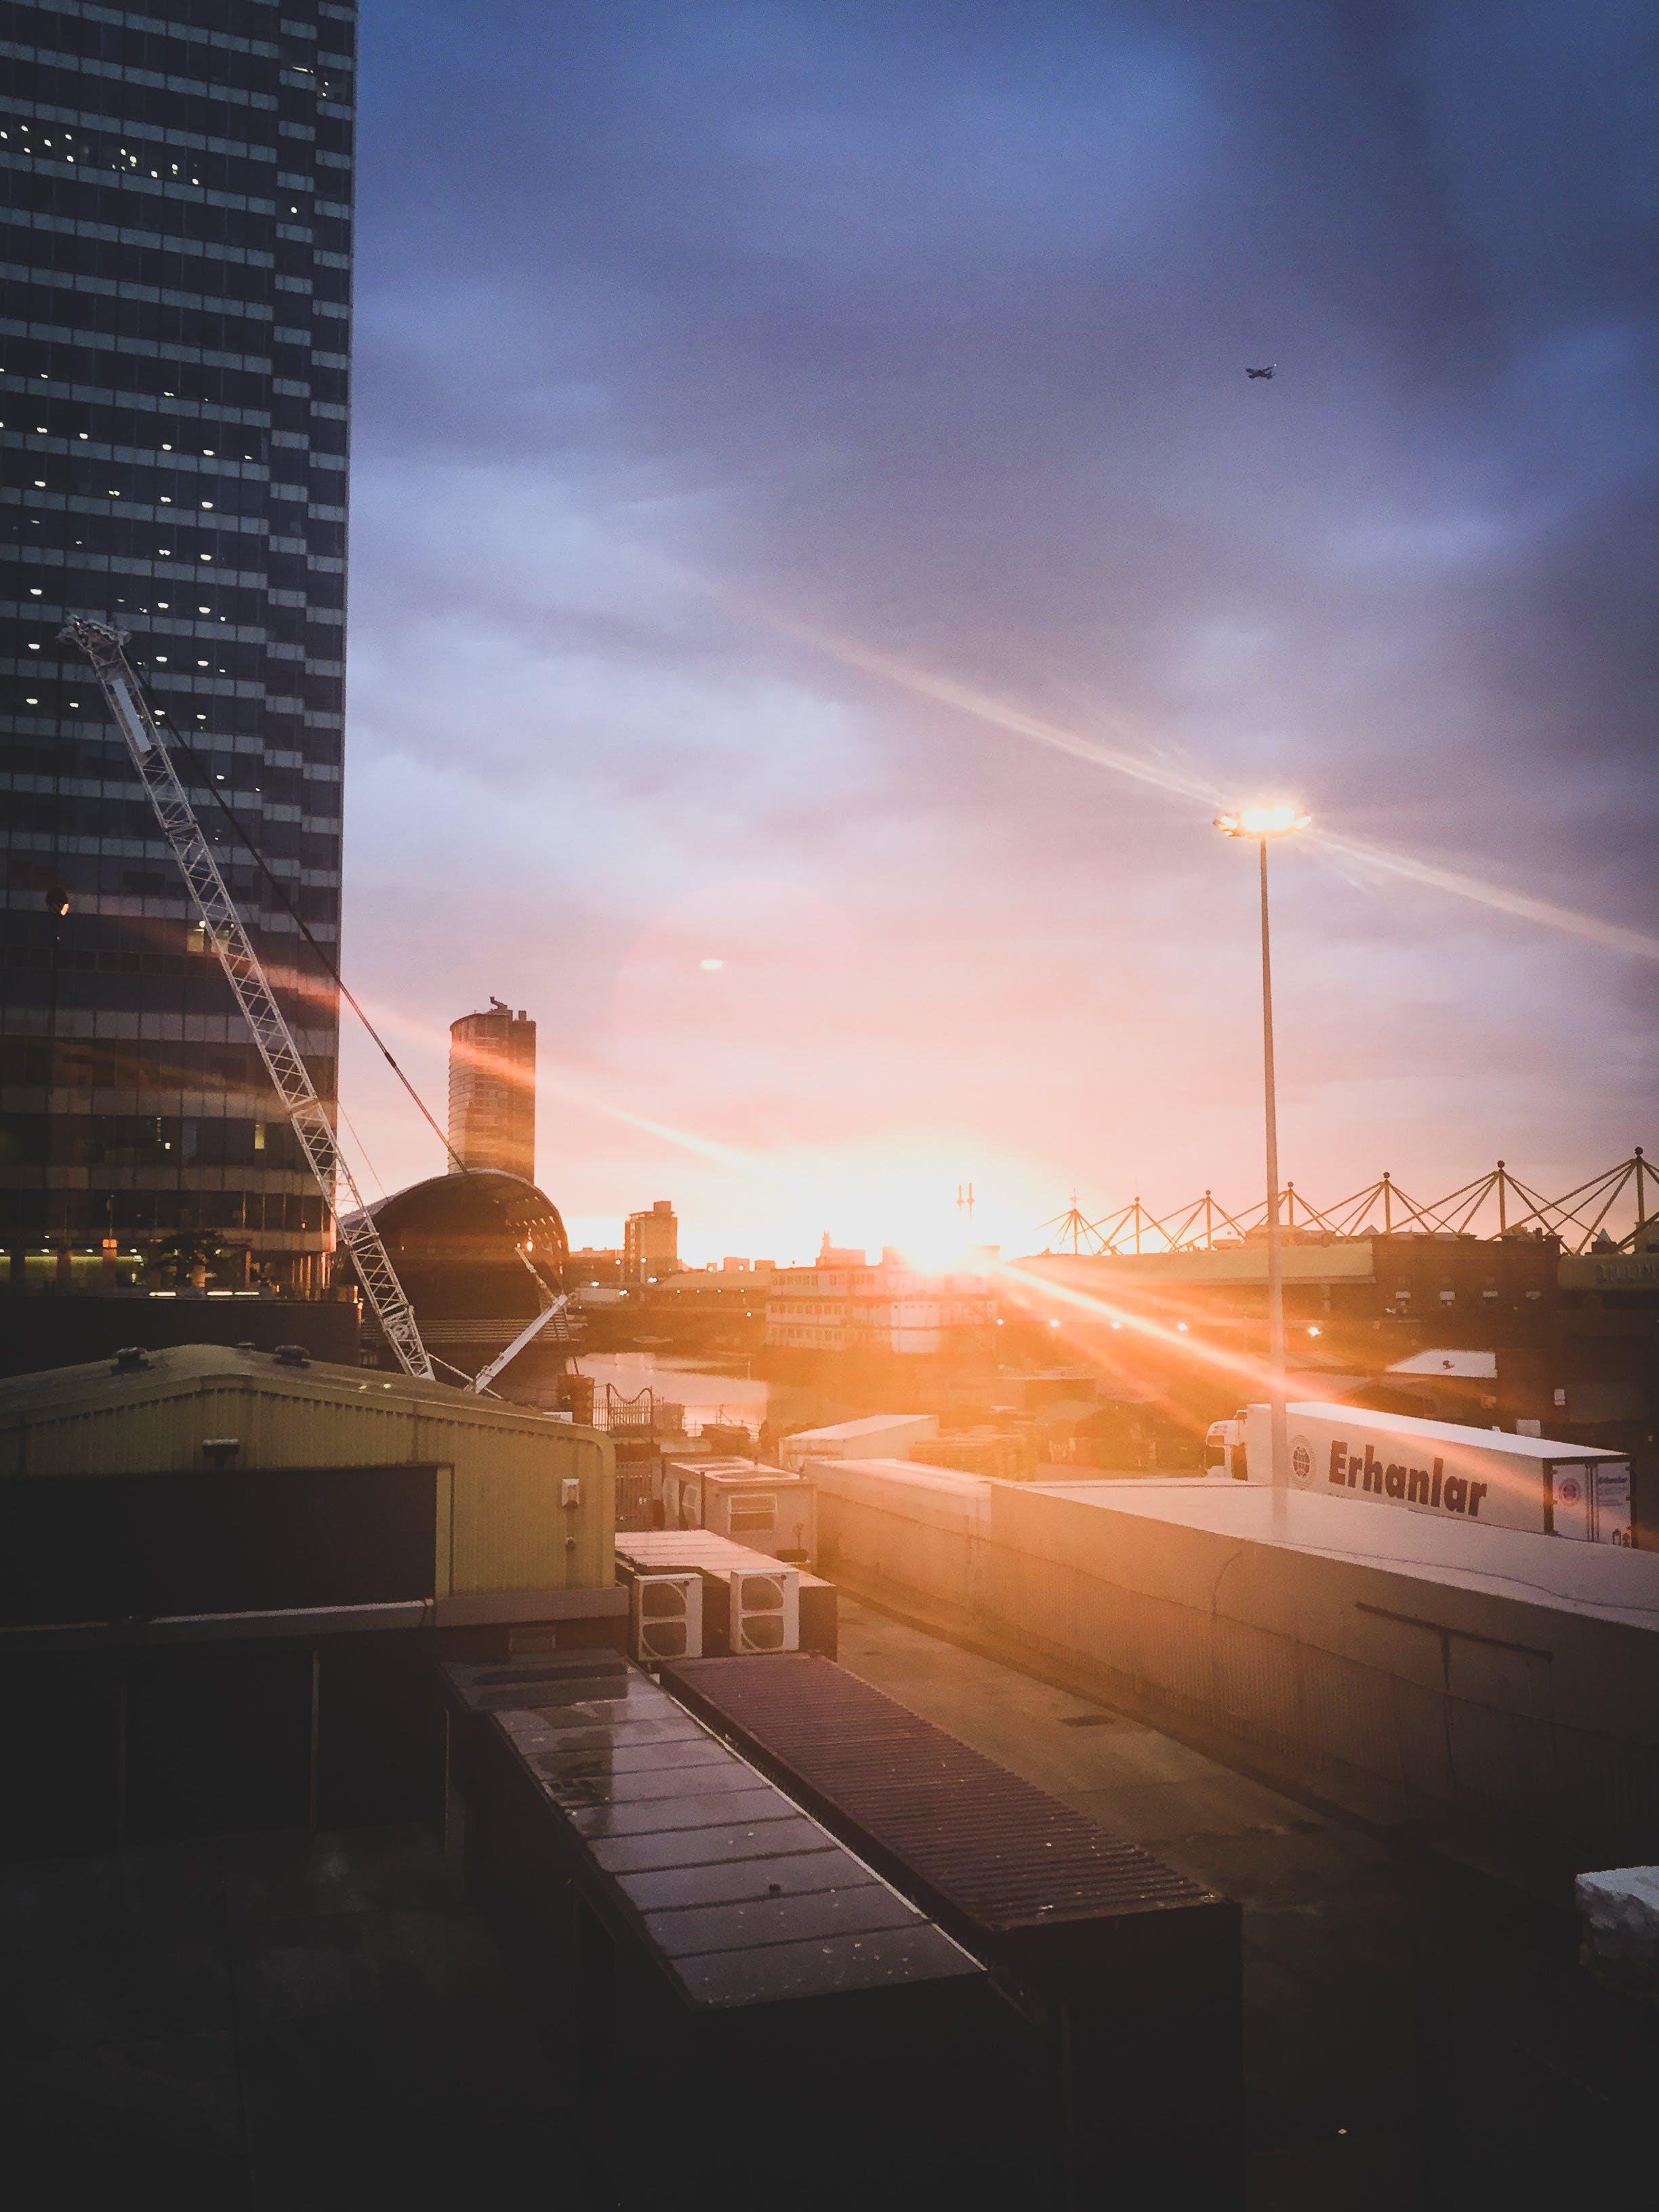 Kostenloses Stock Foto zu abend, architektur, brücke, canary wharf